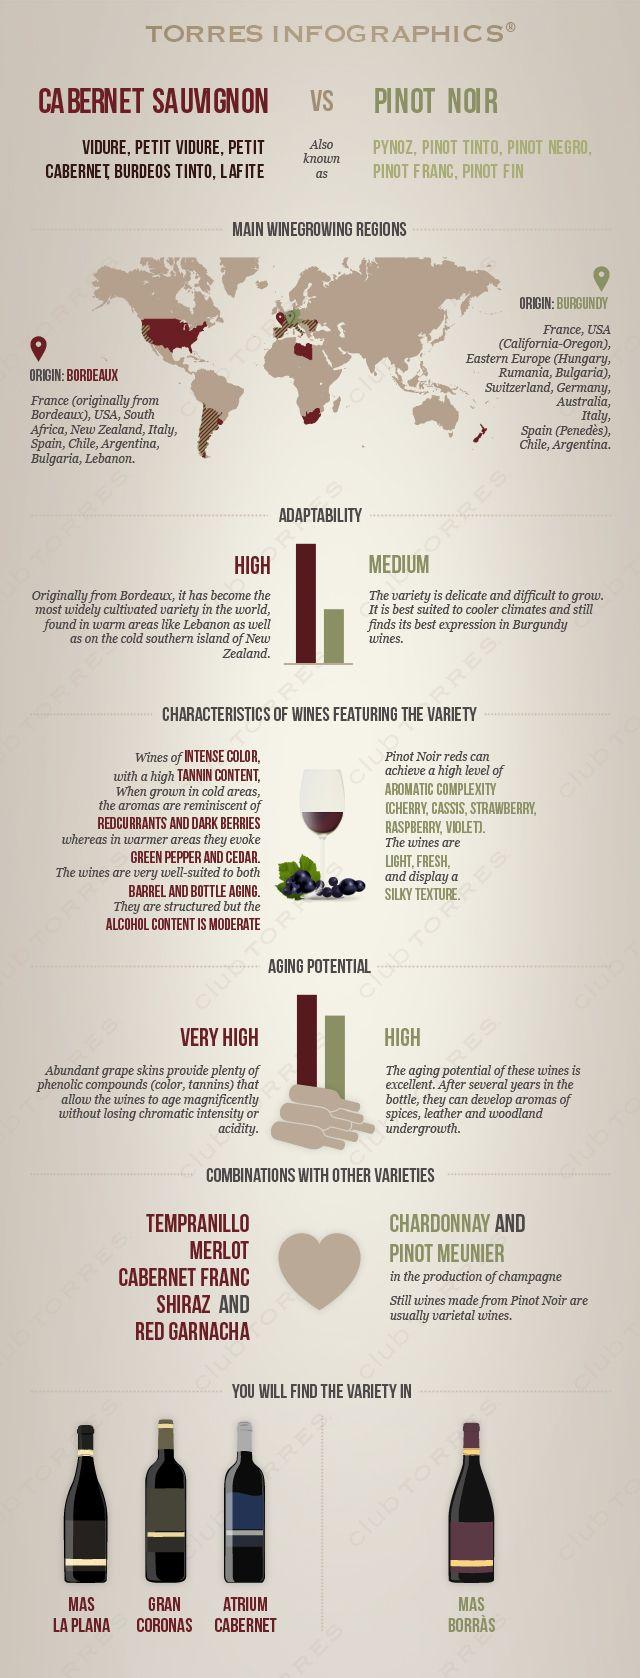 #Infography: Cabernet Sauvignon Vs Pinot Noir. #Wine